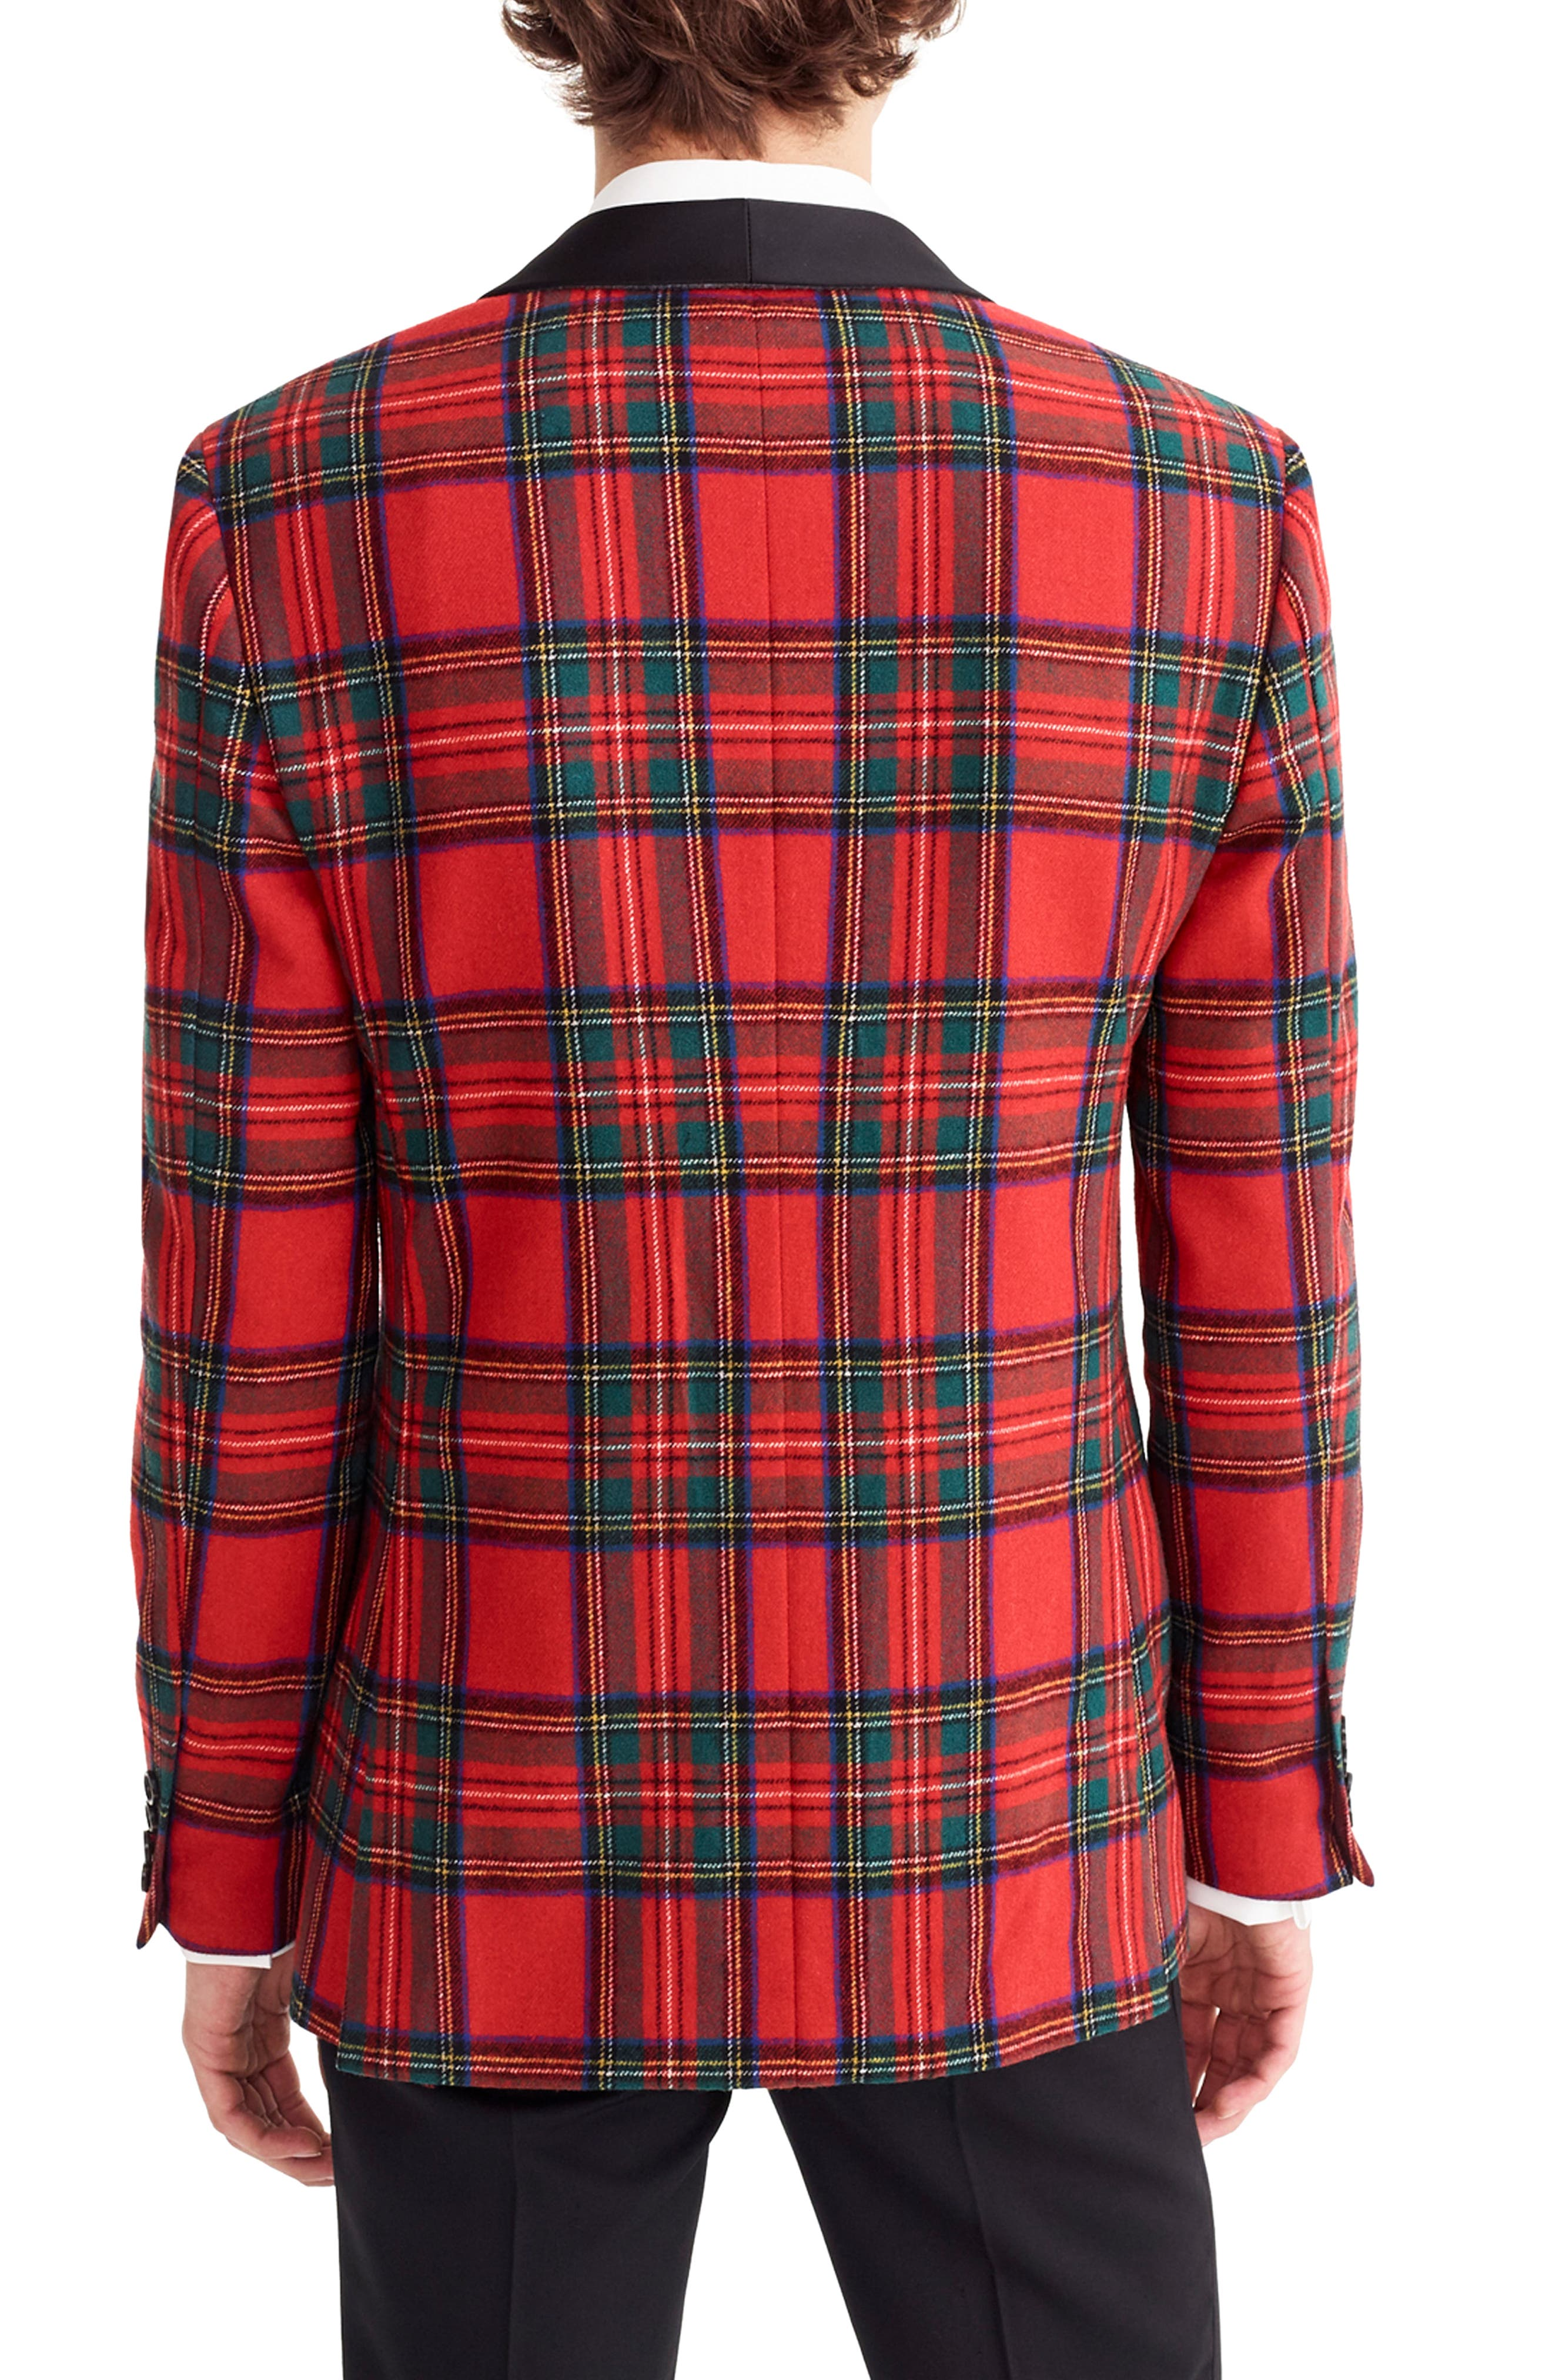 J.CREW,                             Ludlow Slim Fit Tartan Wool Blend Dinner Jacket,                             Alternate thumbnail 2, color,                             600